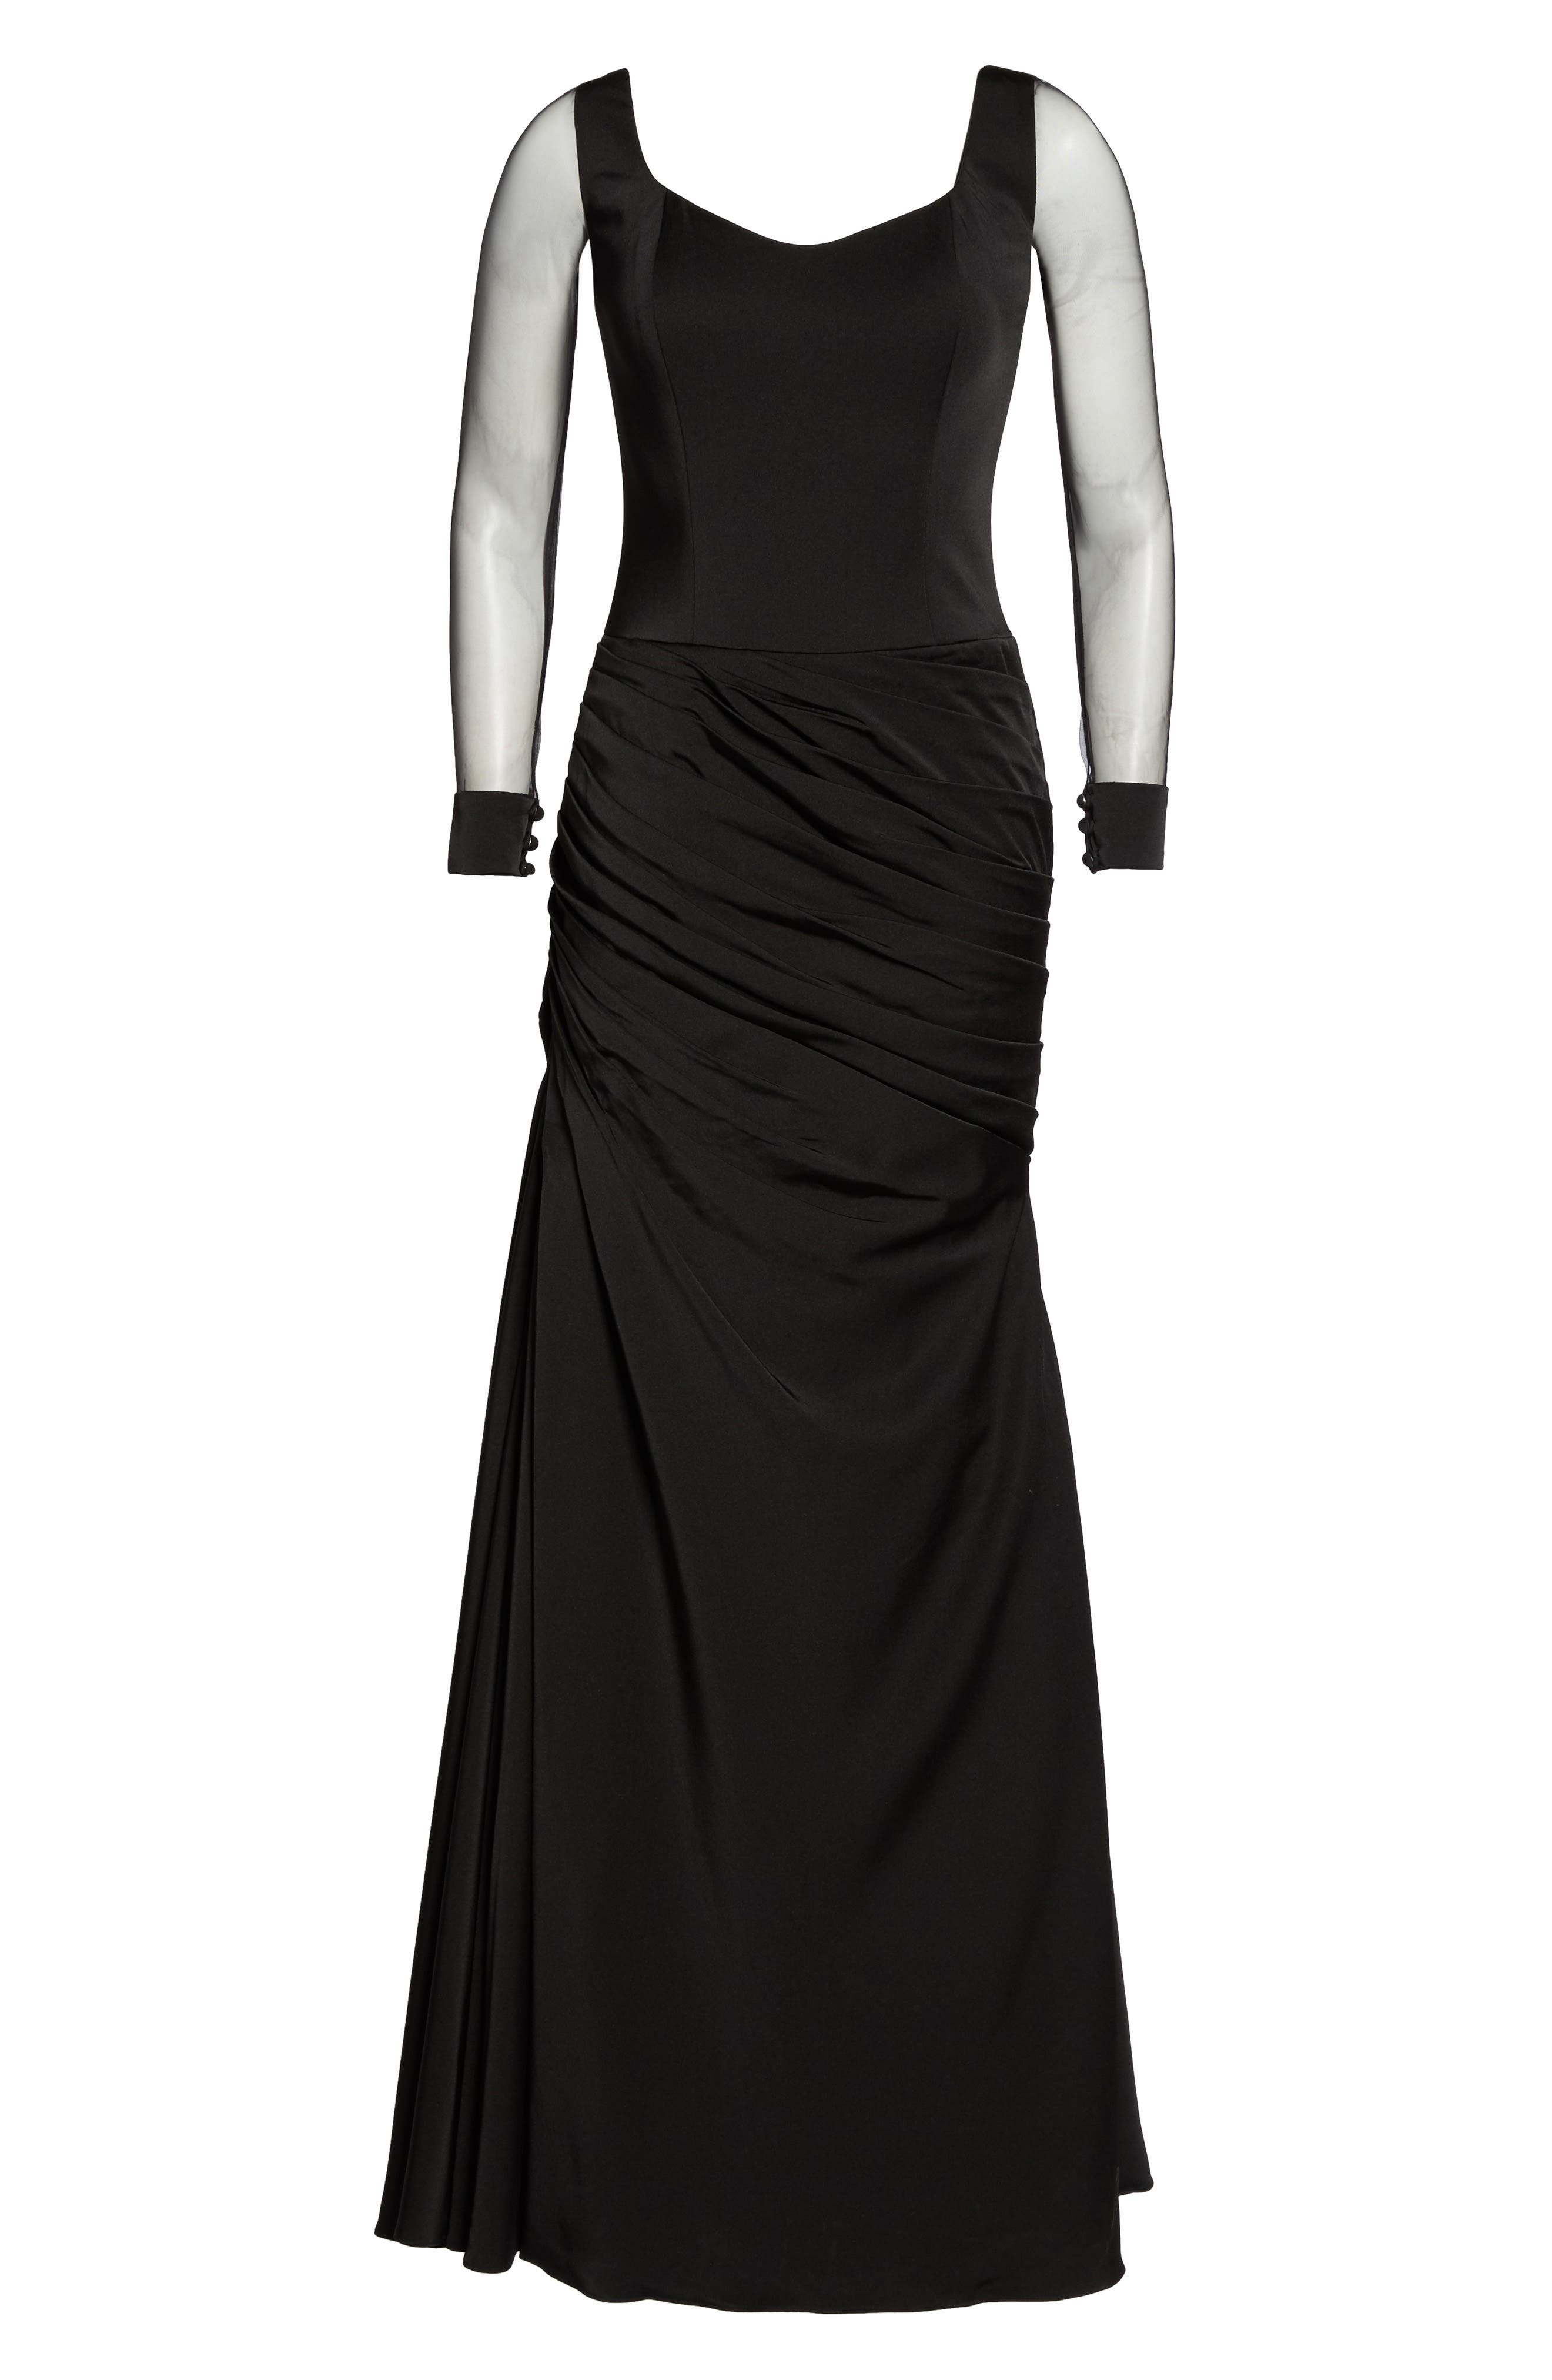 LA FEMME, Sheer Sleeve Gown, Alternate thumbnail 6, color, BLACK